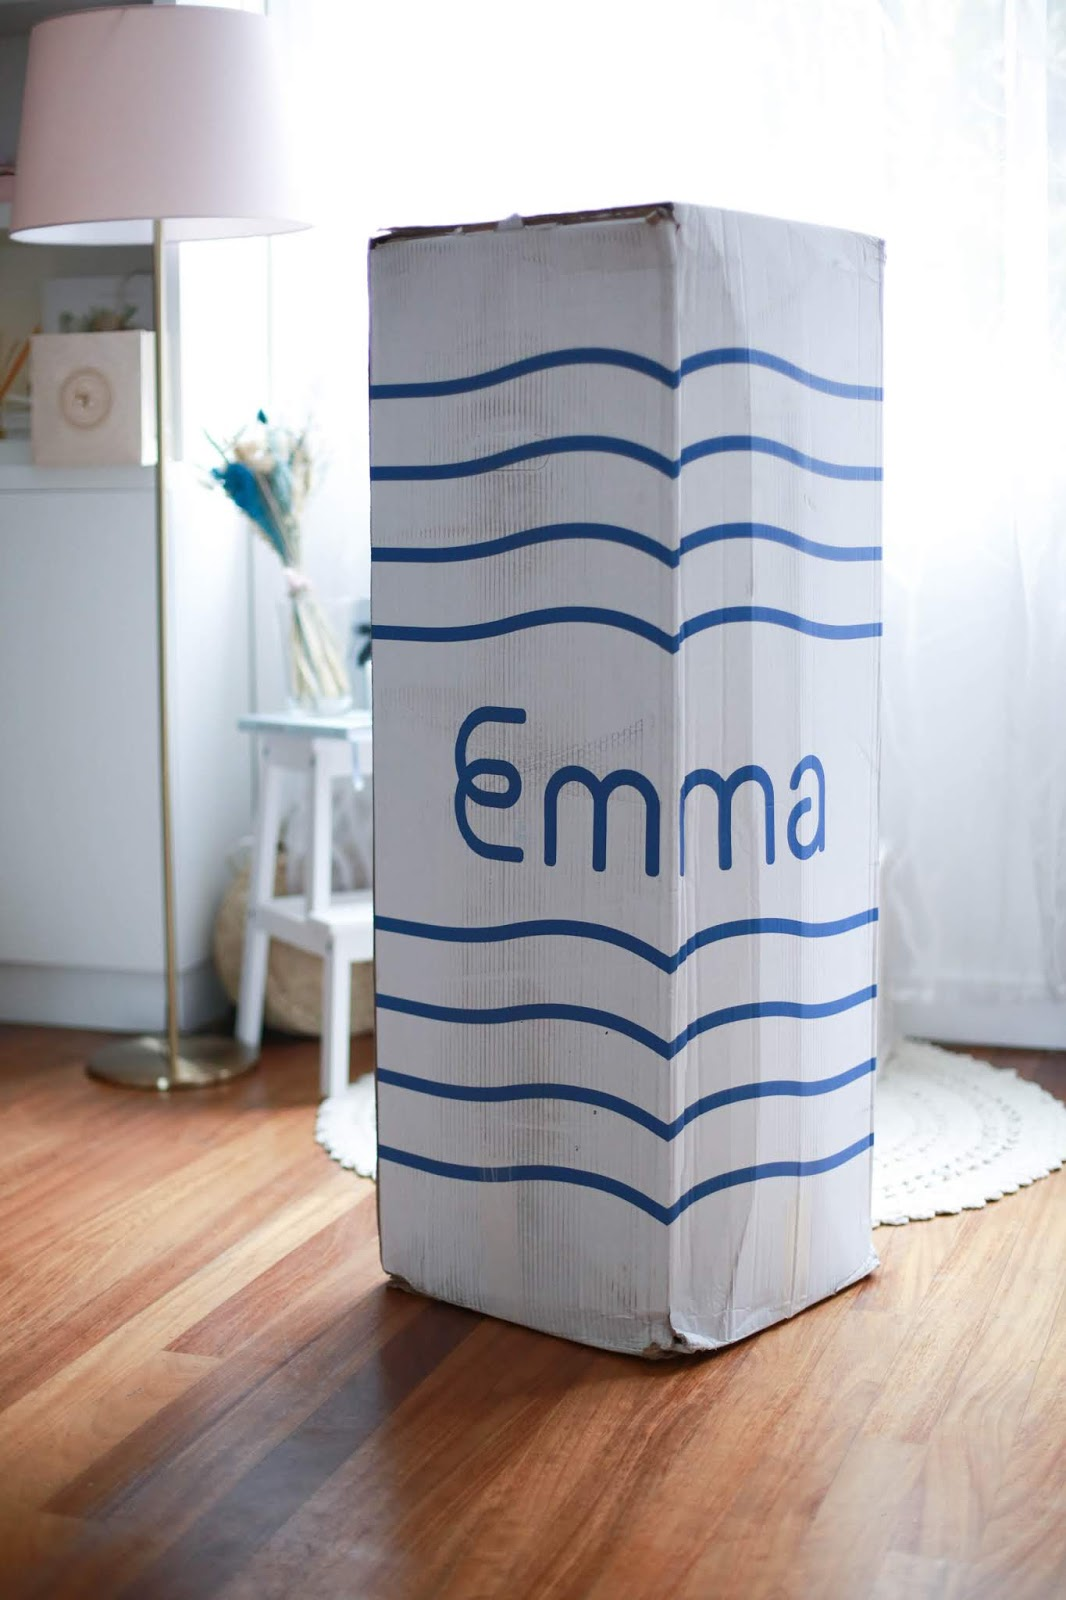 Emma Matelas livraison